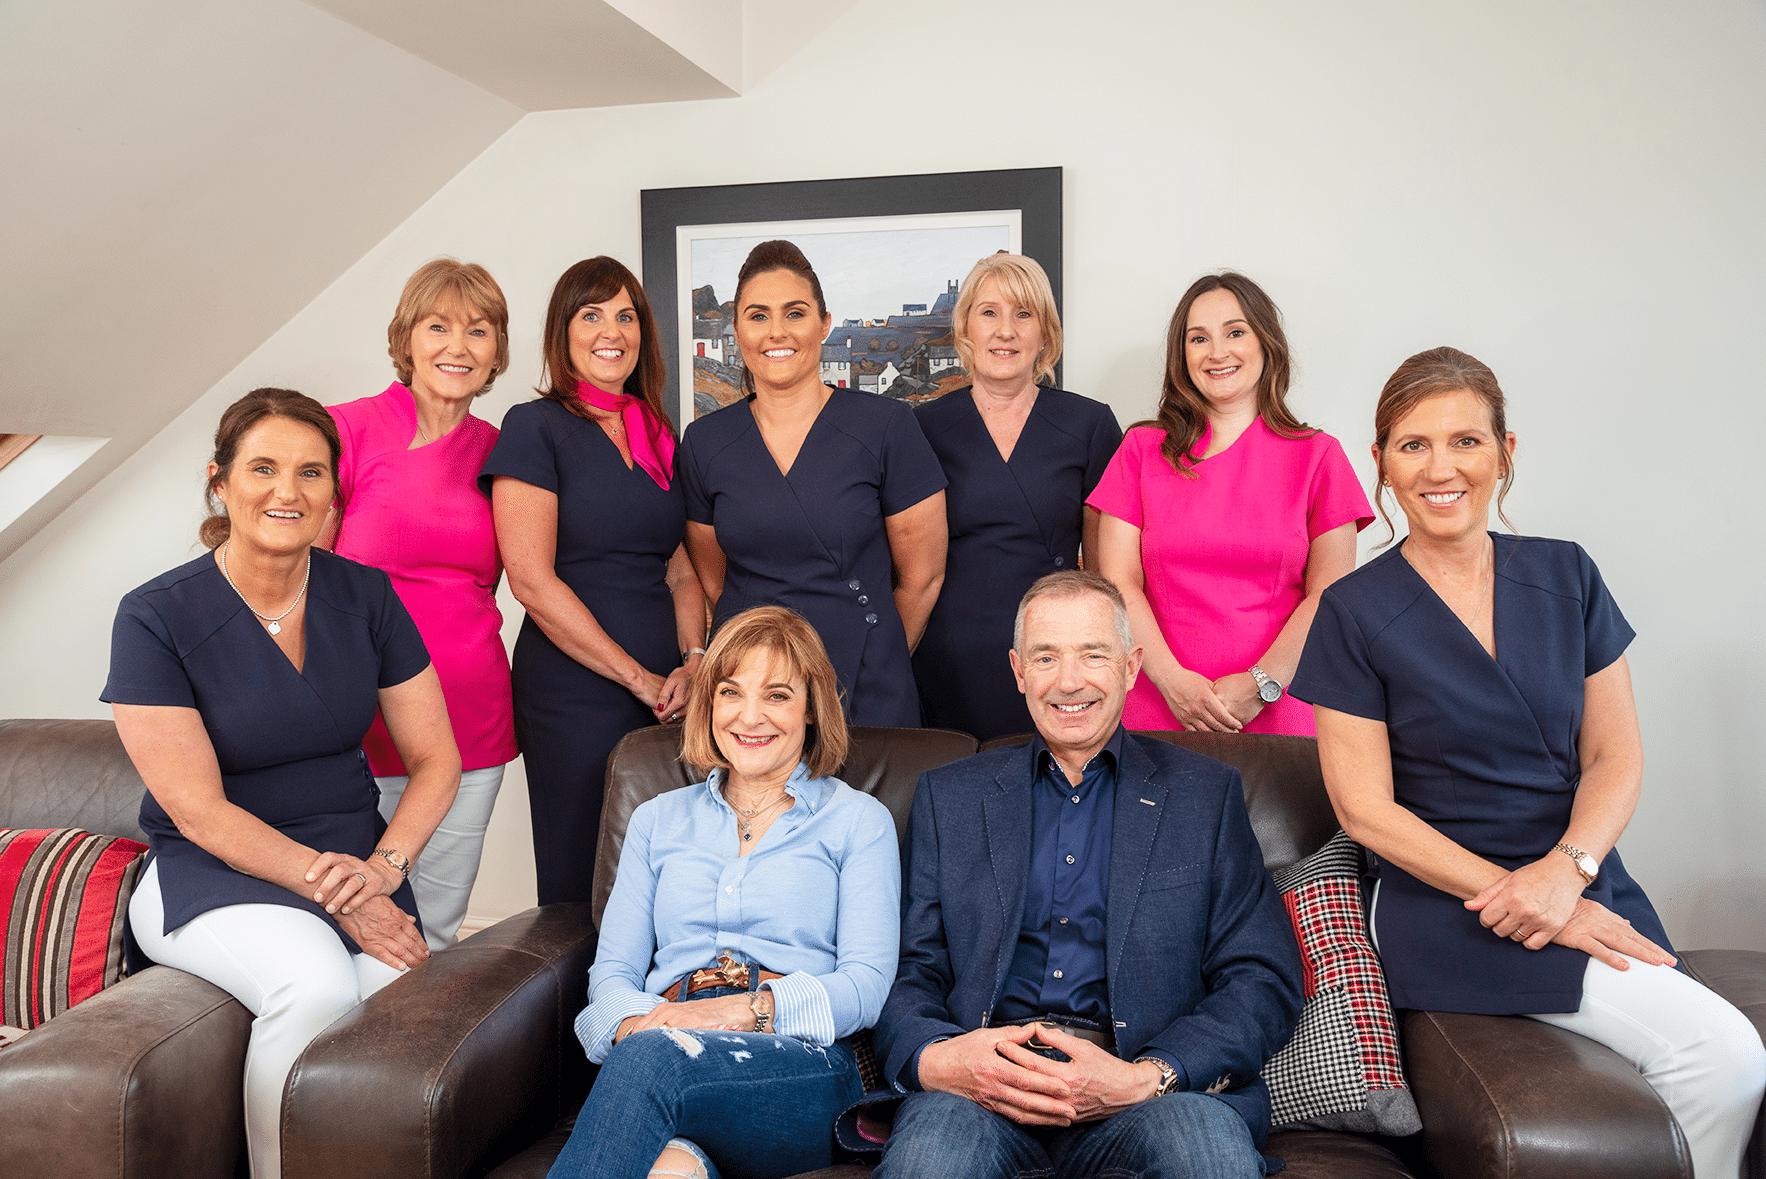 The Whites Dental Care Team Photo